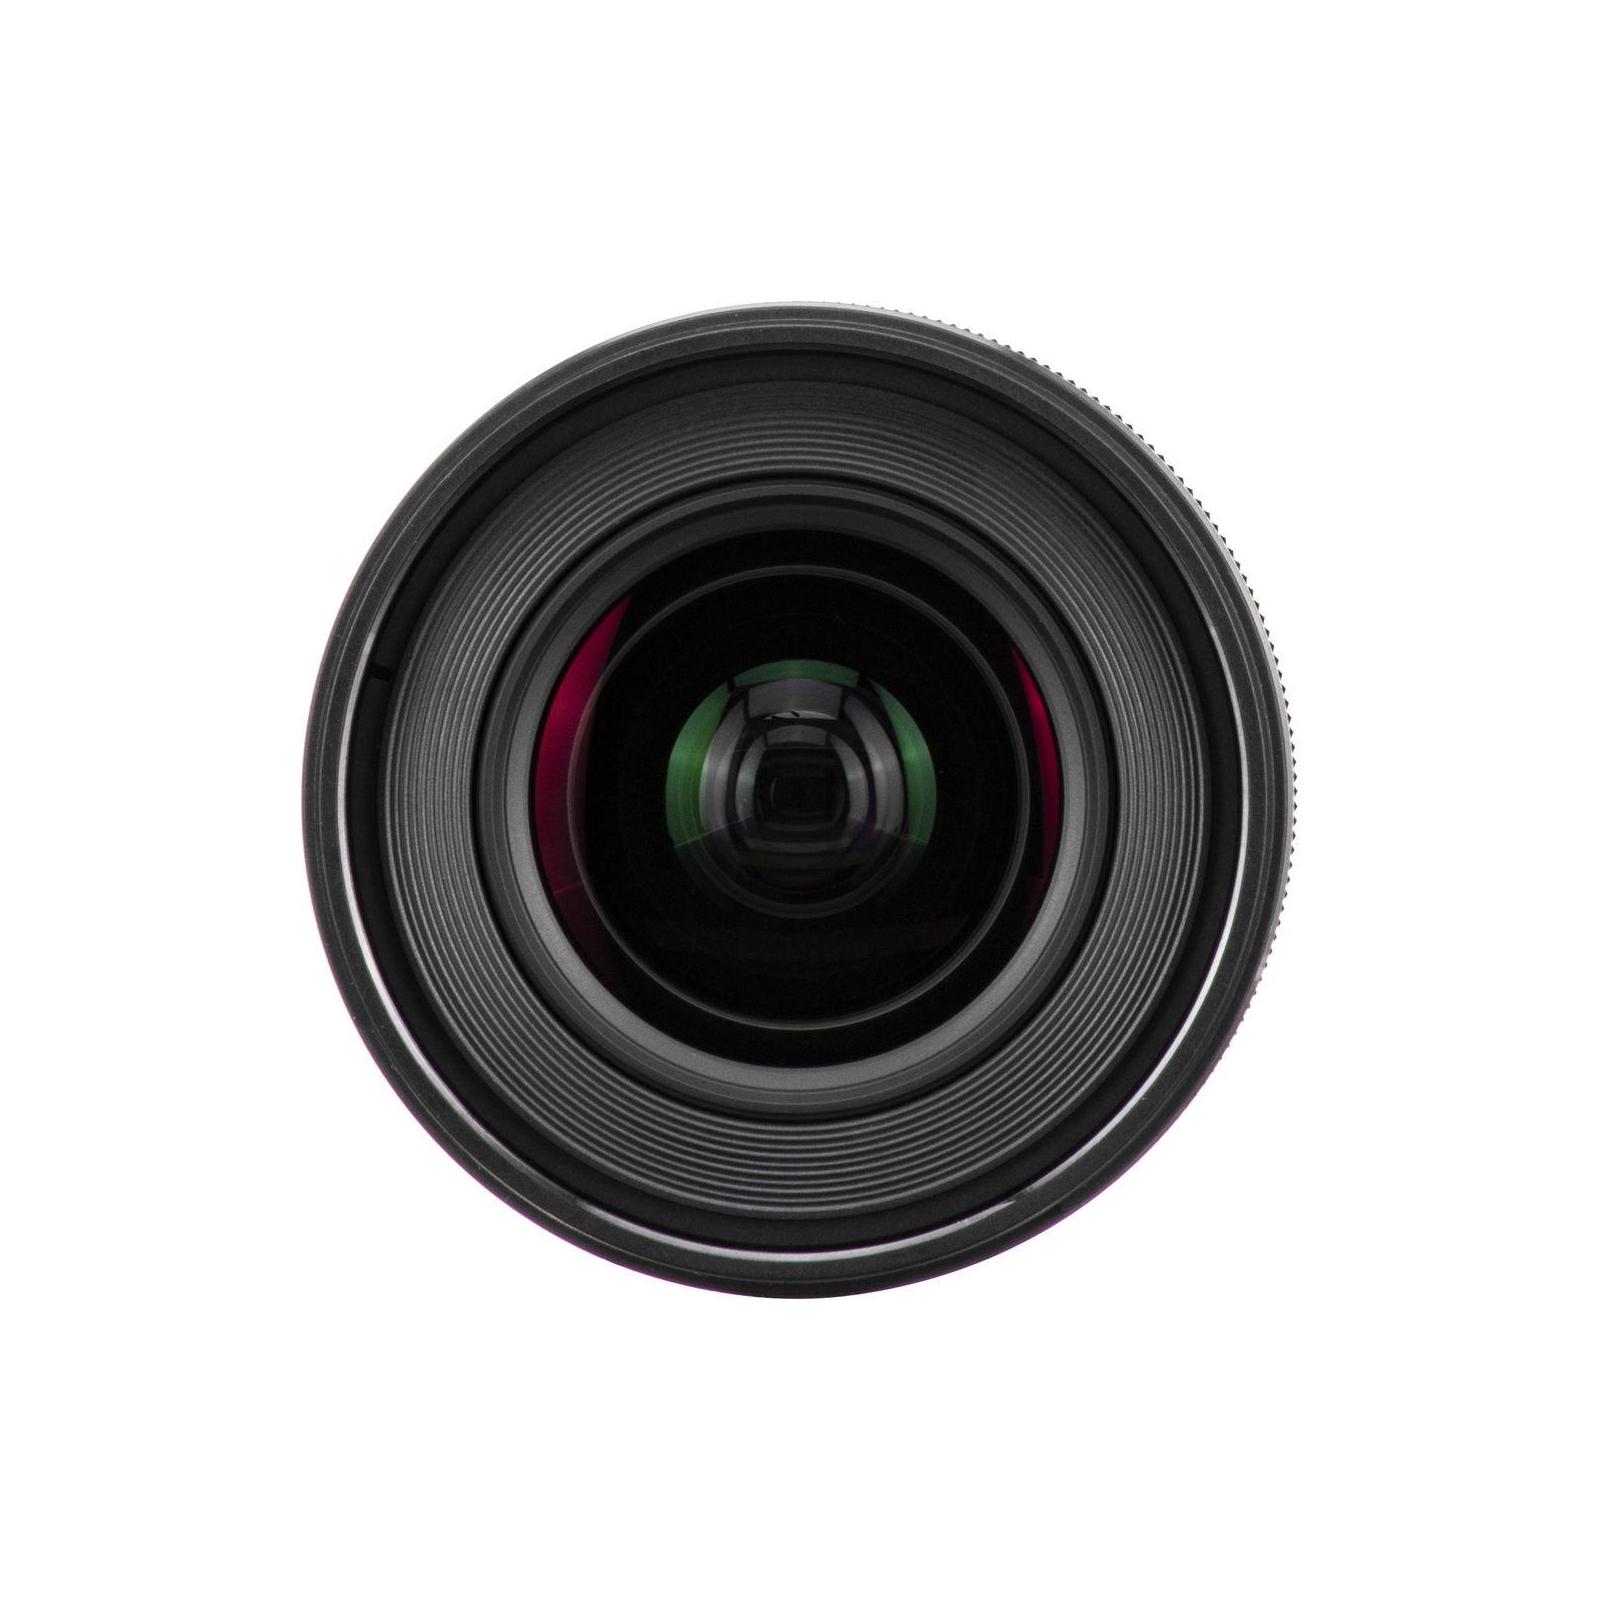 Объектив OLYMPUS EW-M1712 17mm 1:1.2 PRO Black (V311100BW000) изображение 11